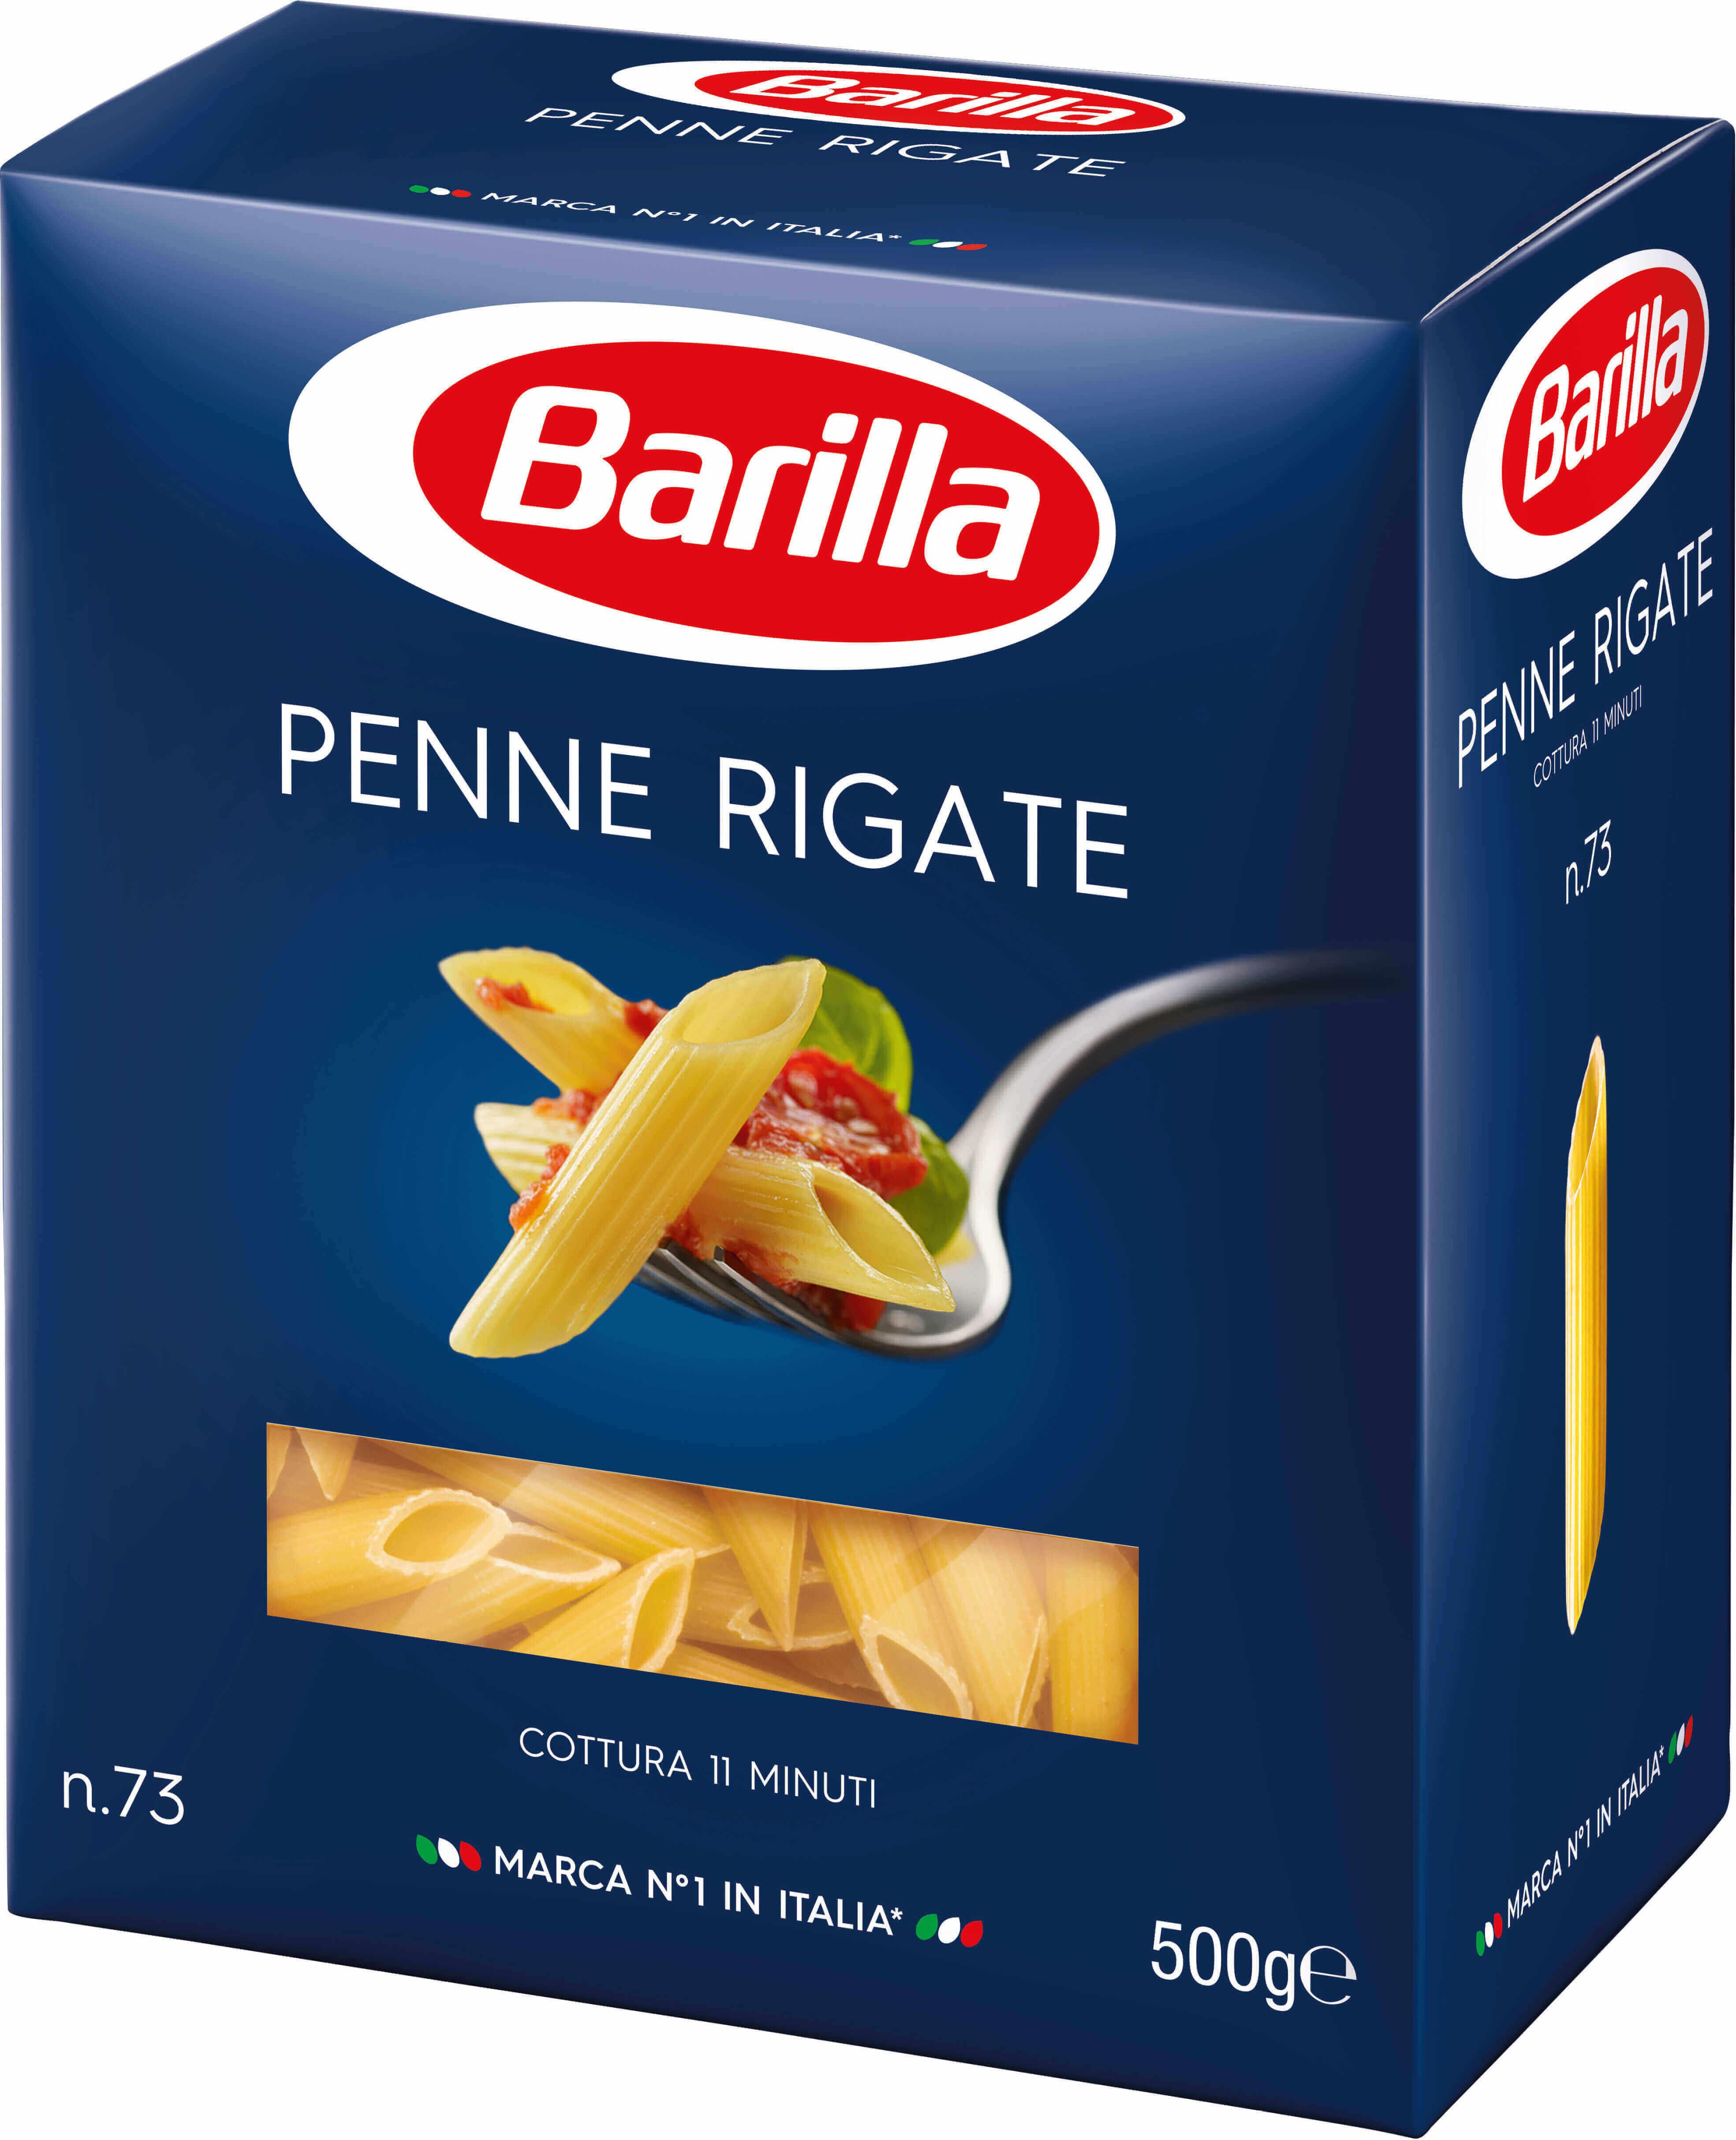 Penne Rigate Barilla (2x500g) τα 2τεμ -0,50€